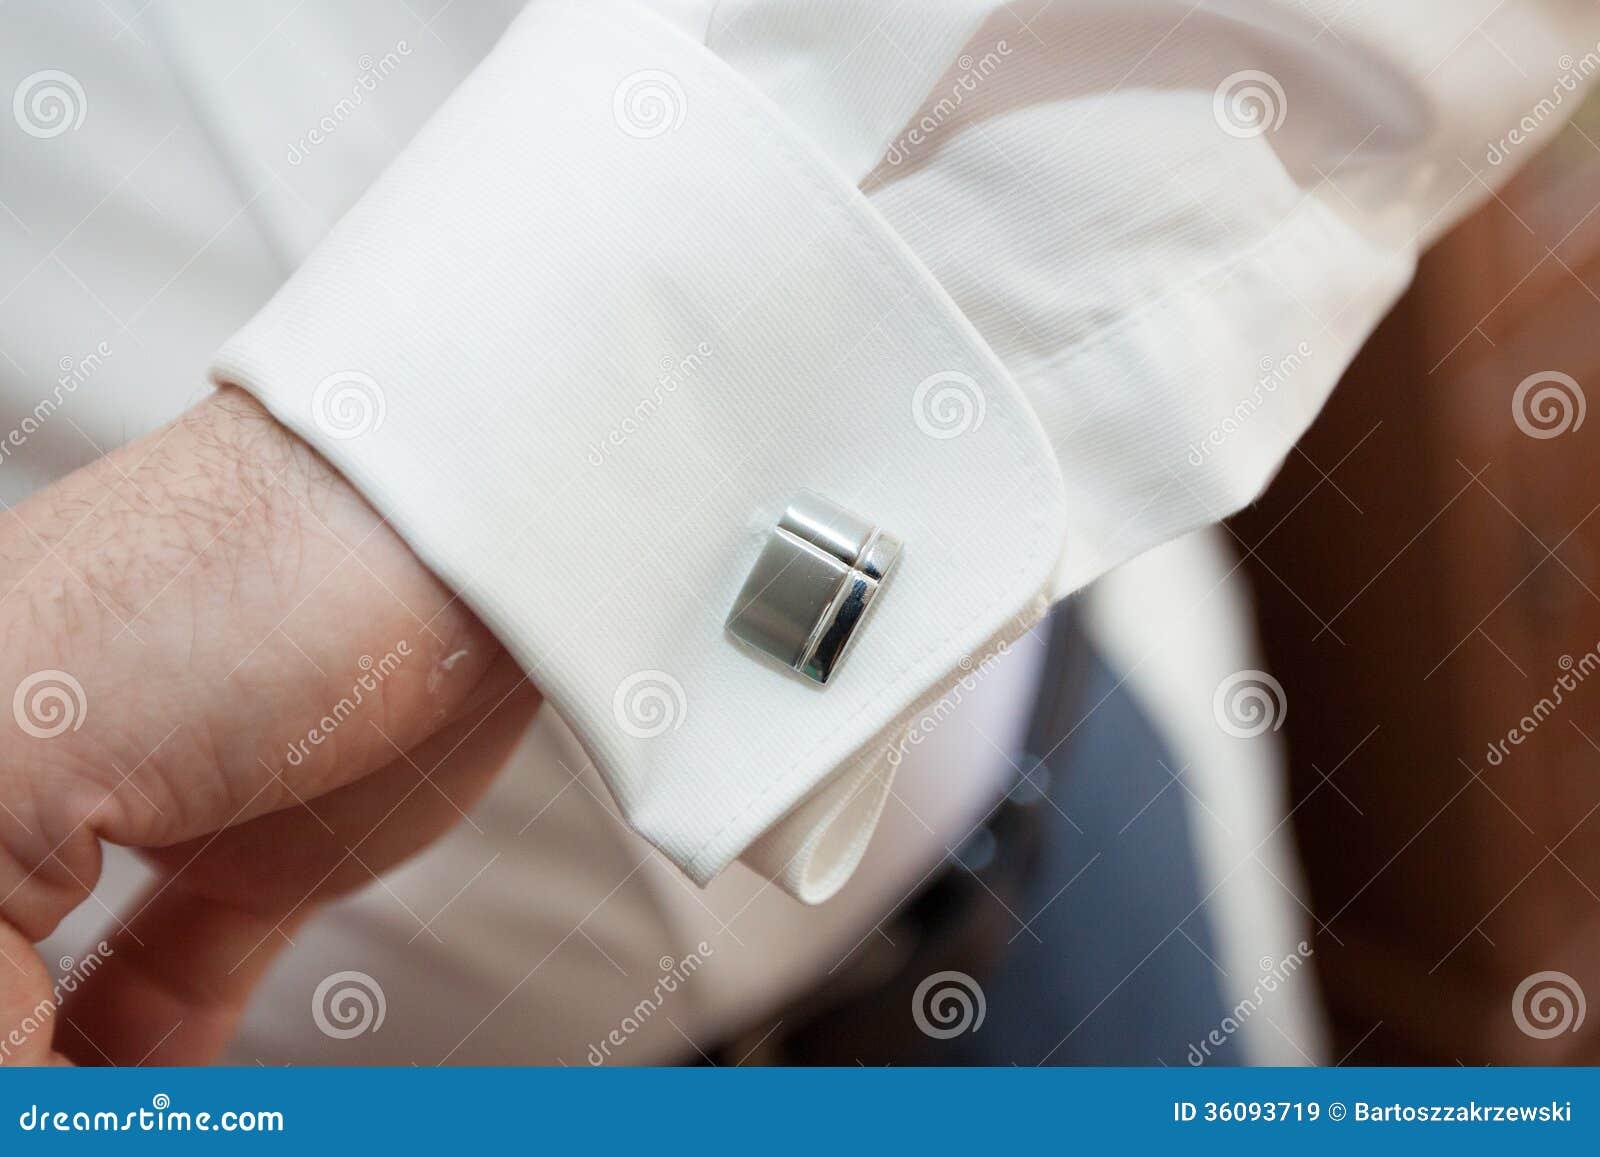 Dress shirt cufflinks in a suit stock image image 36093719 for Dress shirt for cufflinks